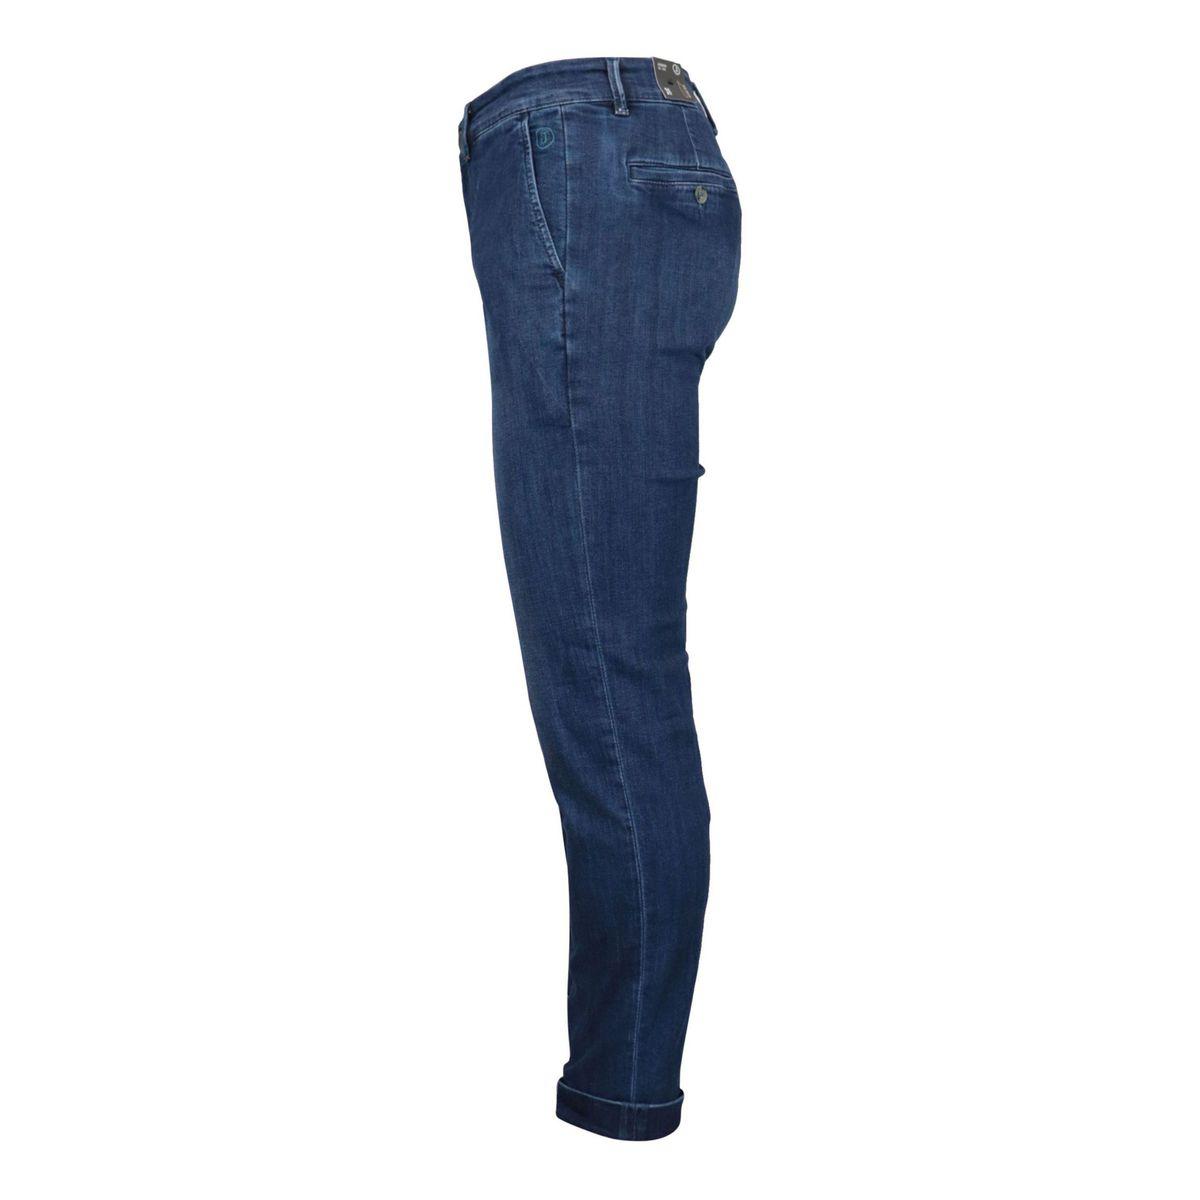 Dark denim chino jeans with america pocket Denim Jeckerson